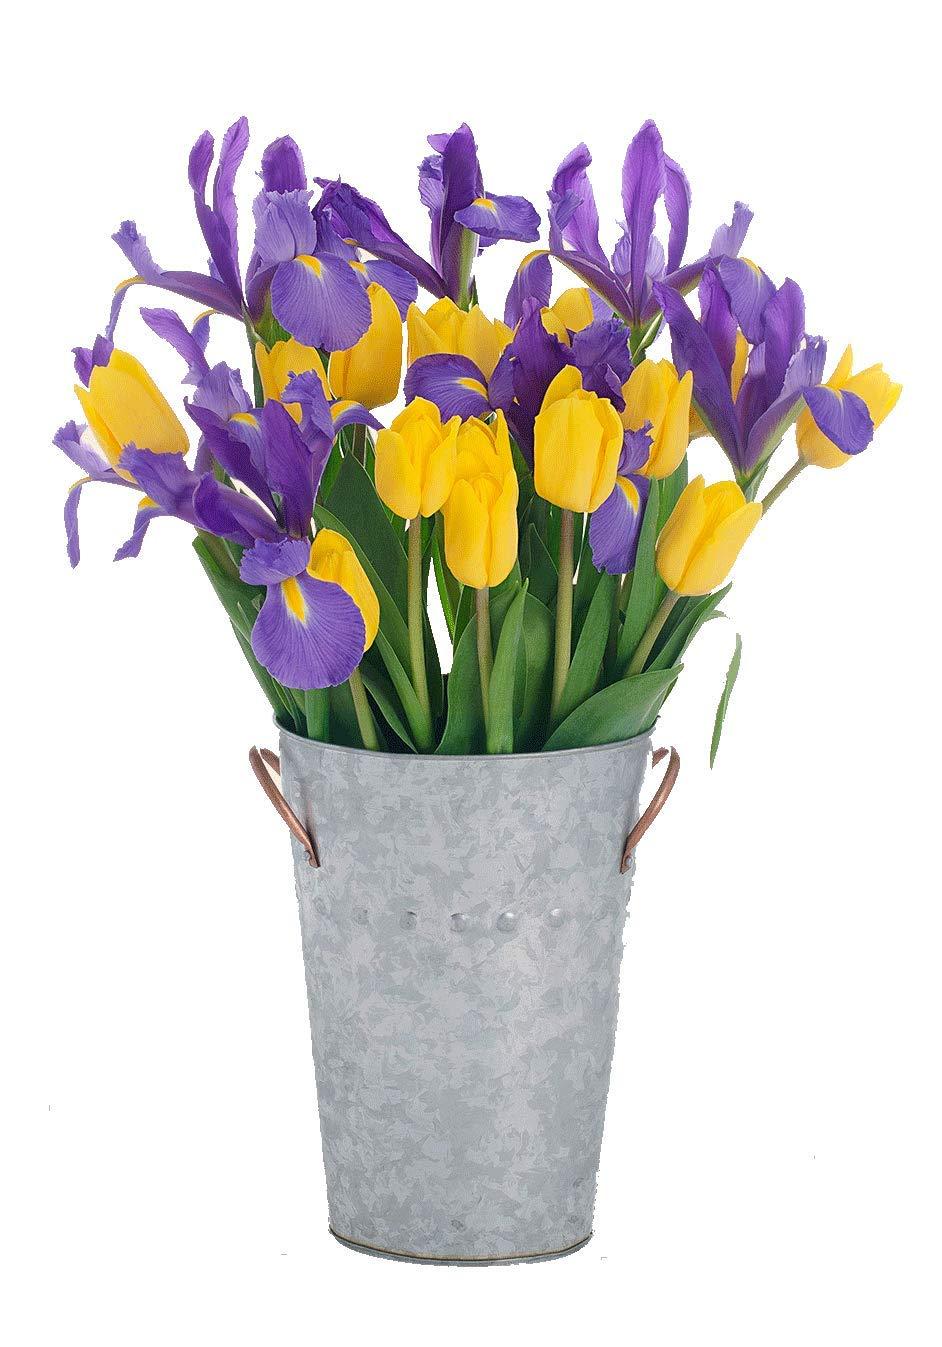 Stargazer Barn - Butterfly Bouquet - 2 Dozen Tulips & Iris with French Bucket Style Vase - Farm Fresh